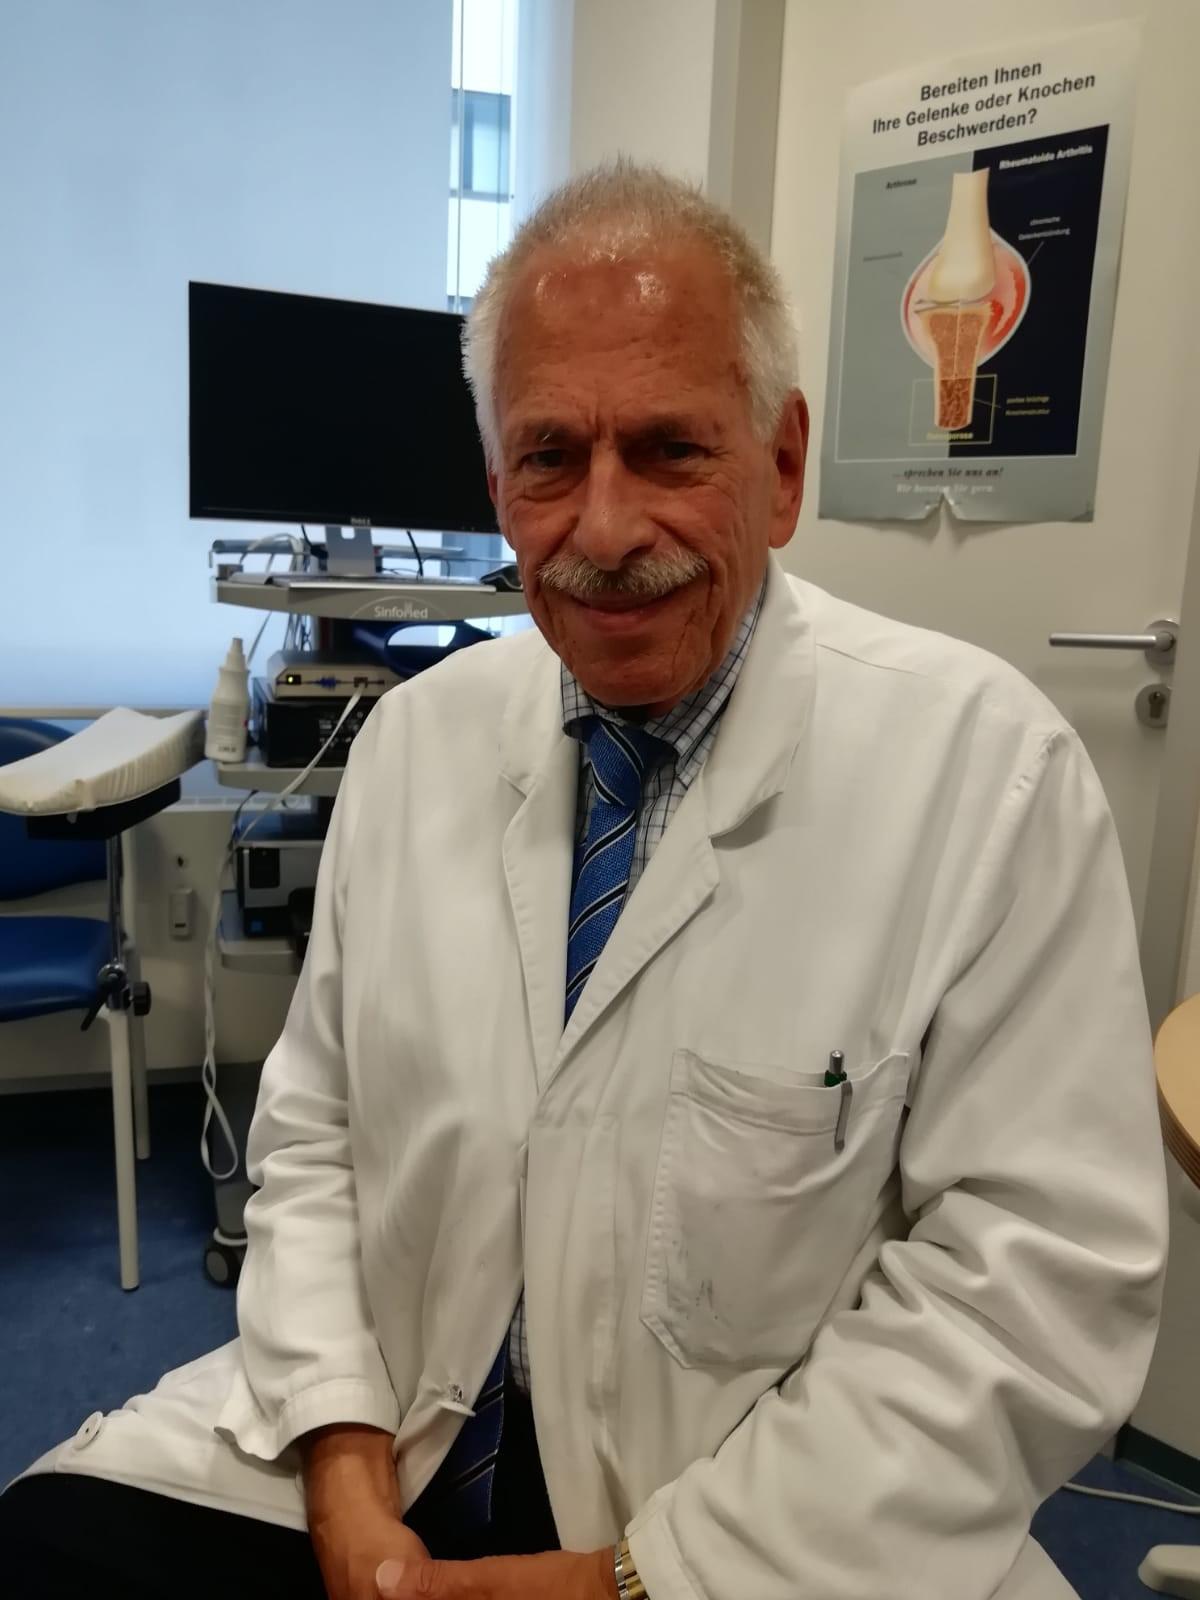 Dr. Albert Güßbacher spricht im Interview über das Thema Rückenschmerzen.